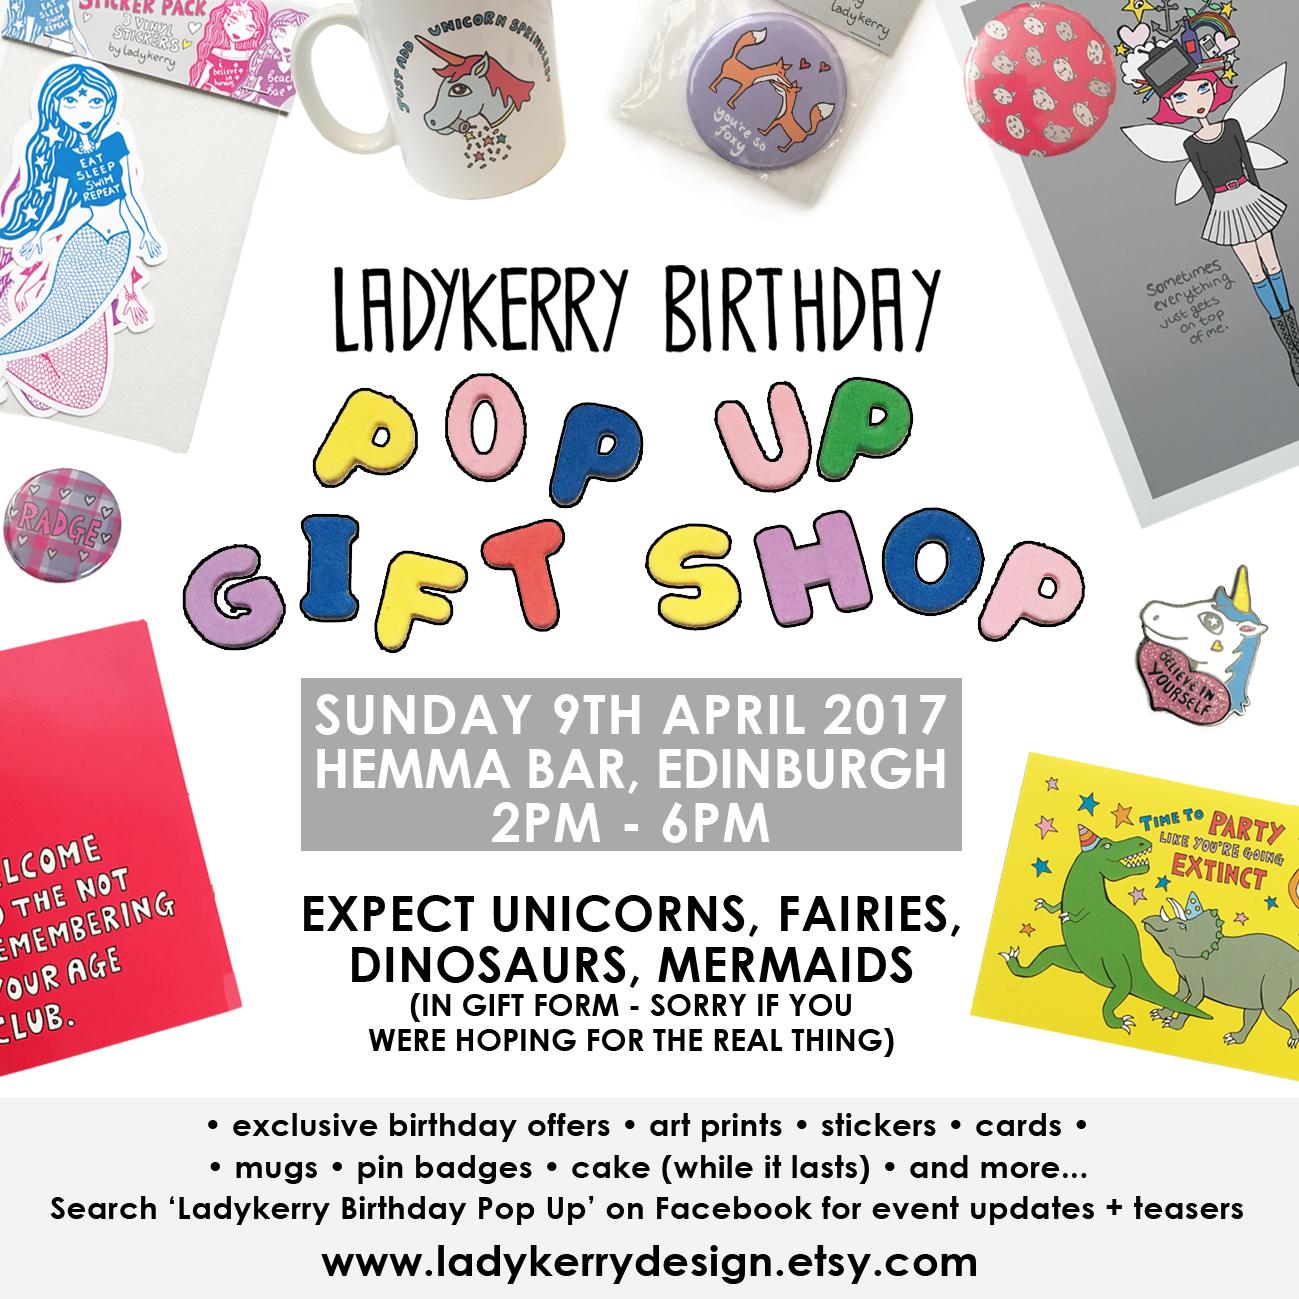 Ladykerry Birthday Pop Up Gift Shop, Pop Up Edinburgh